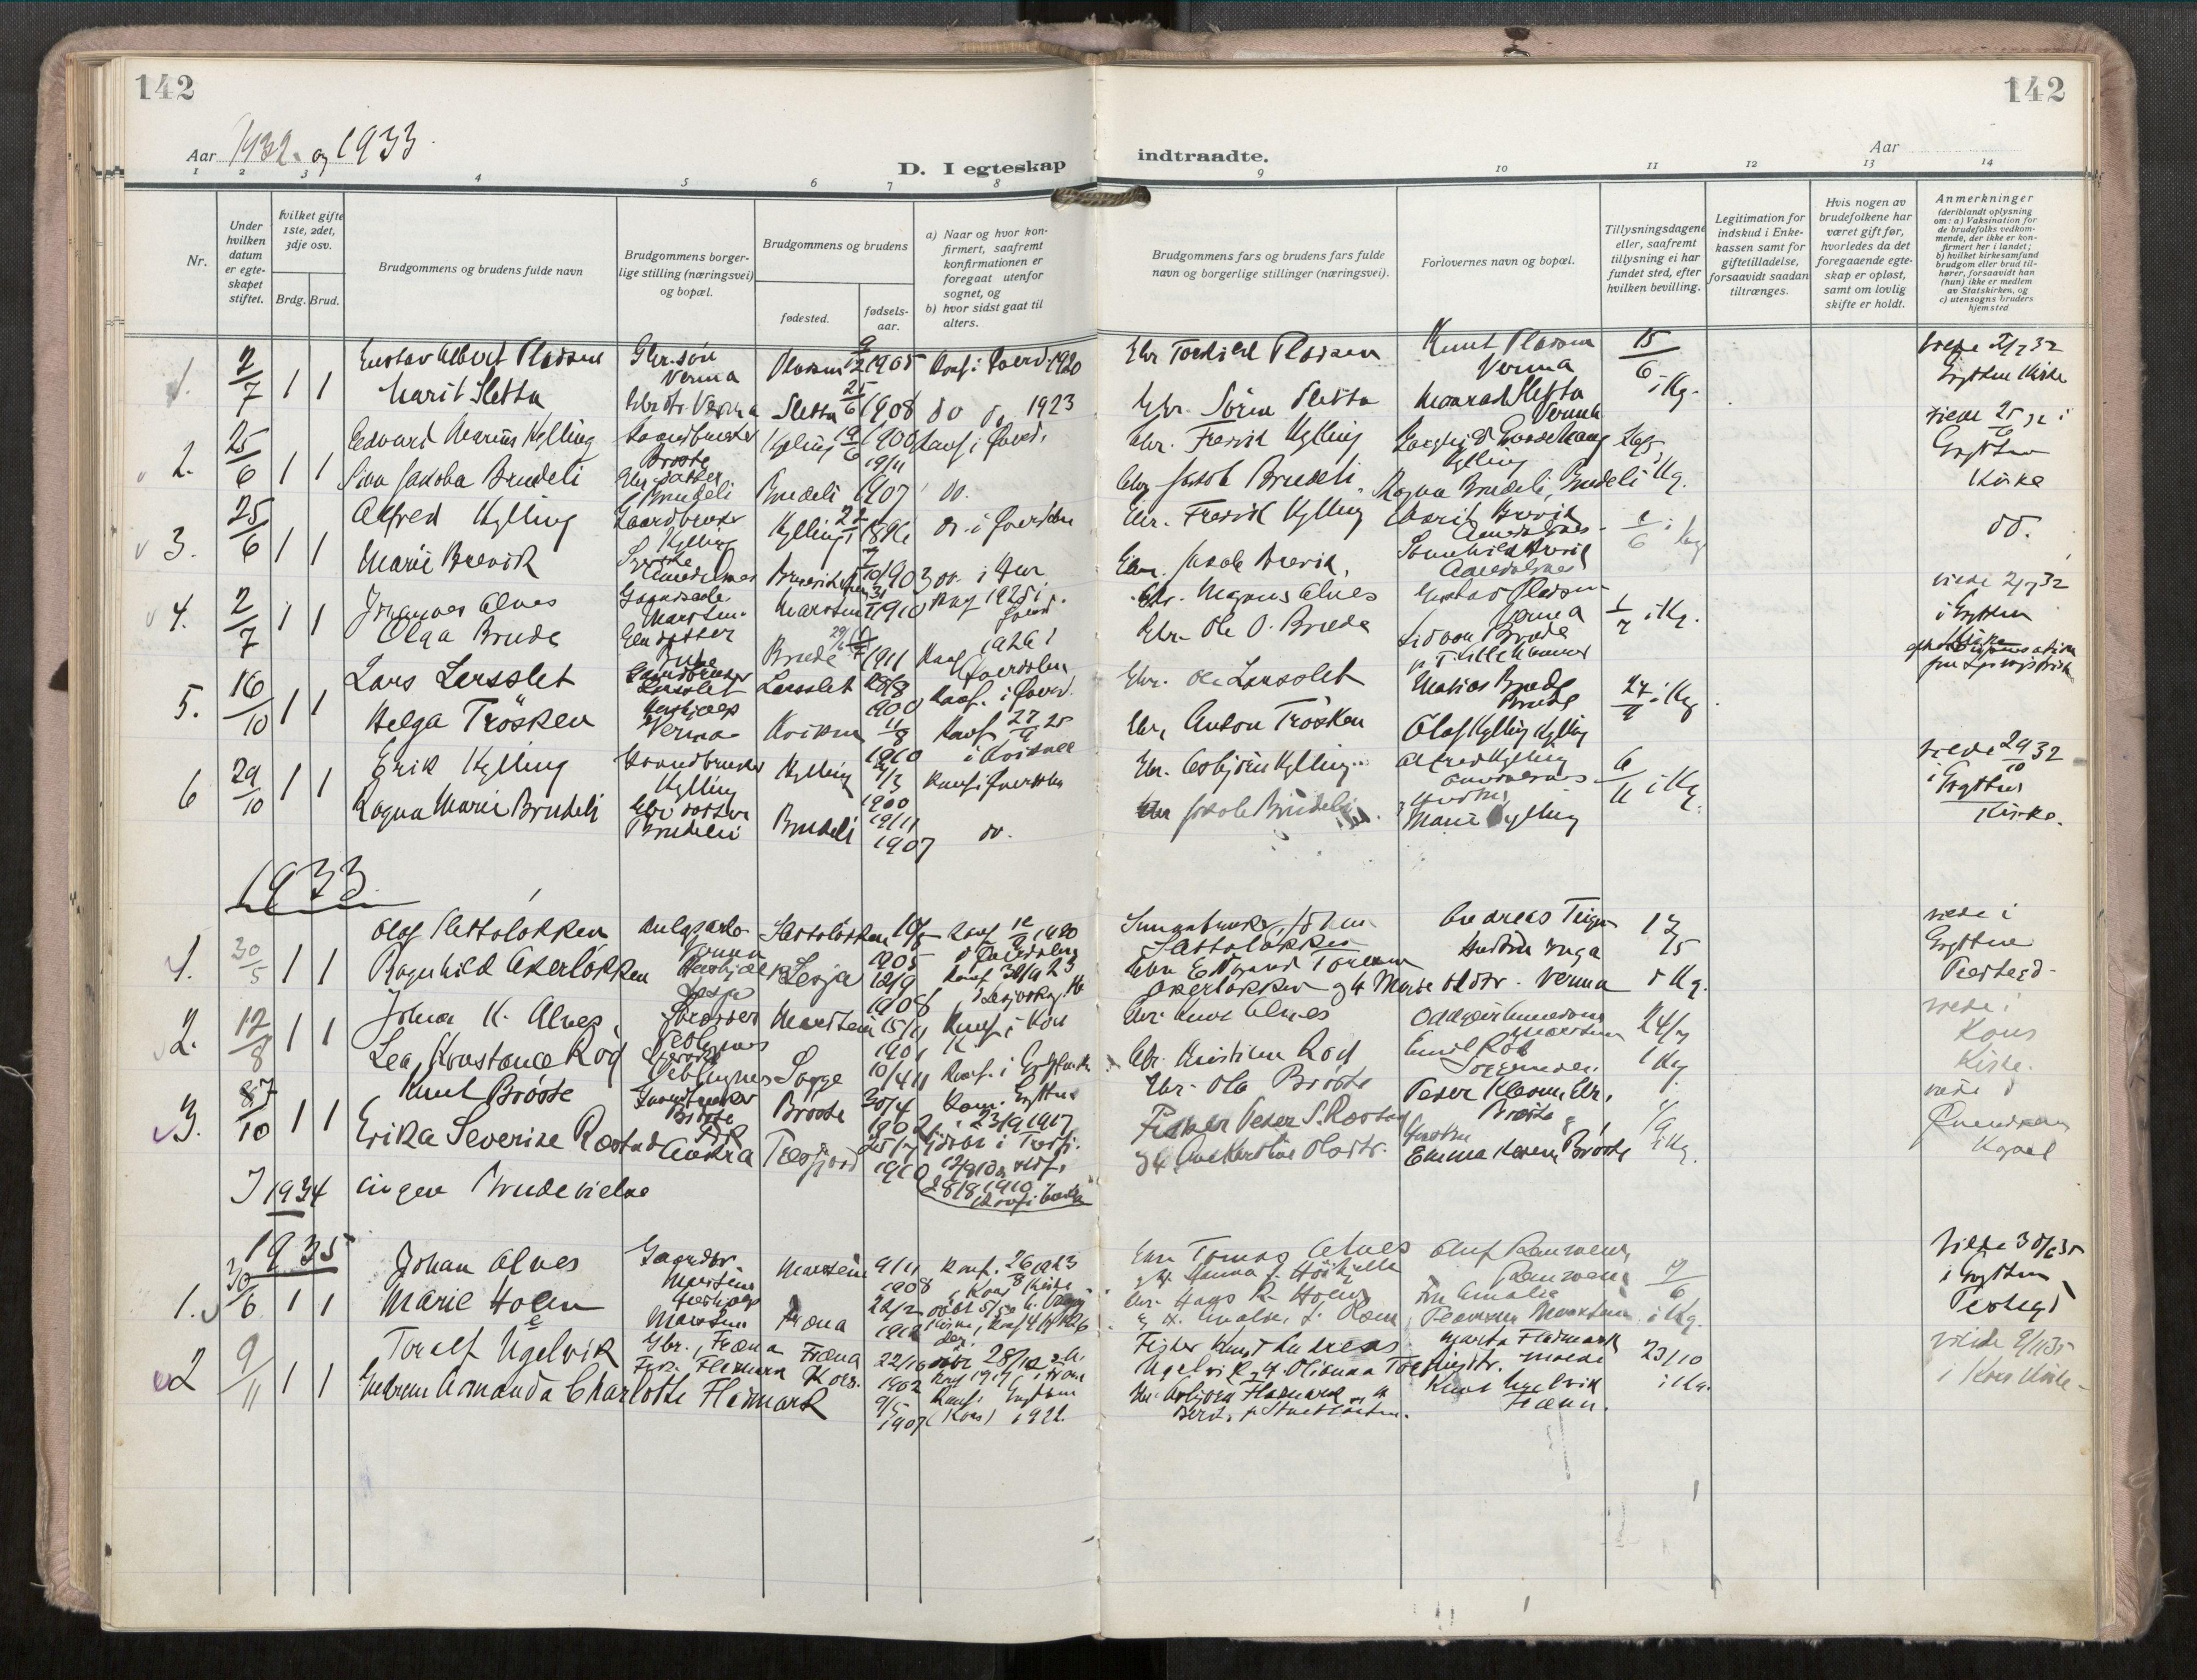 SAT, Grytten sokneprestkontor, Ministerialbok nr. 546A04, 1919-1956, s. 142